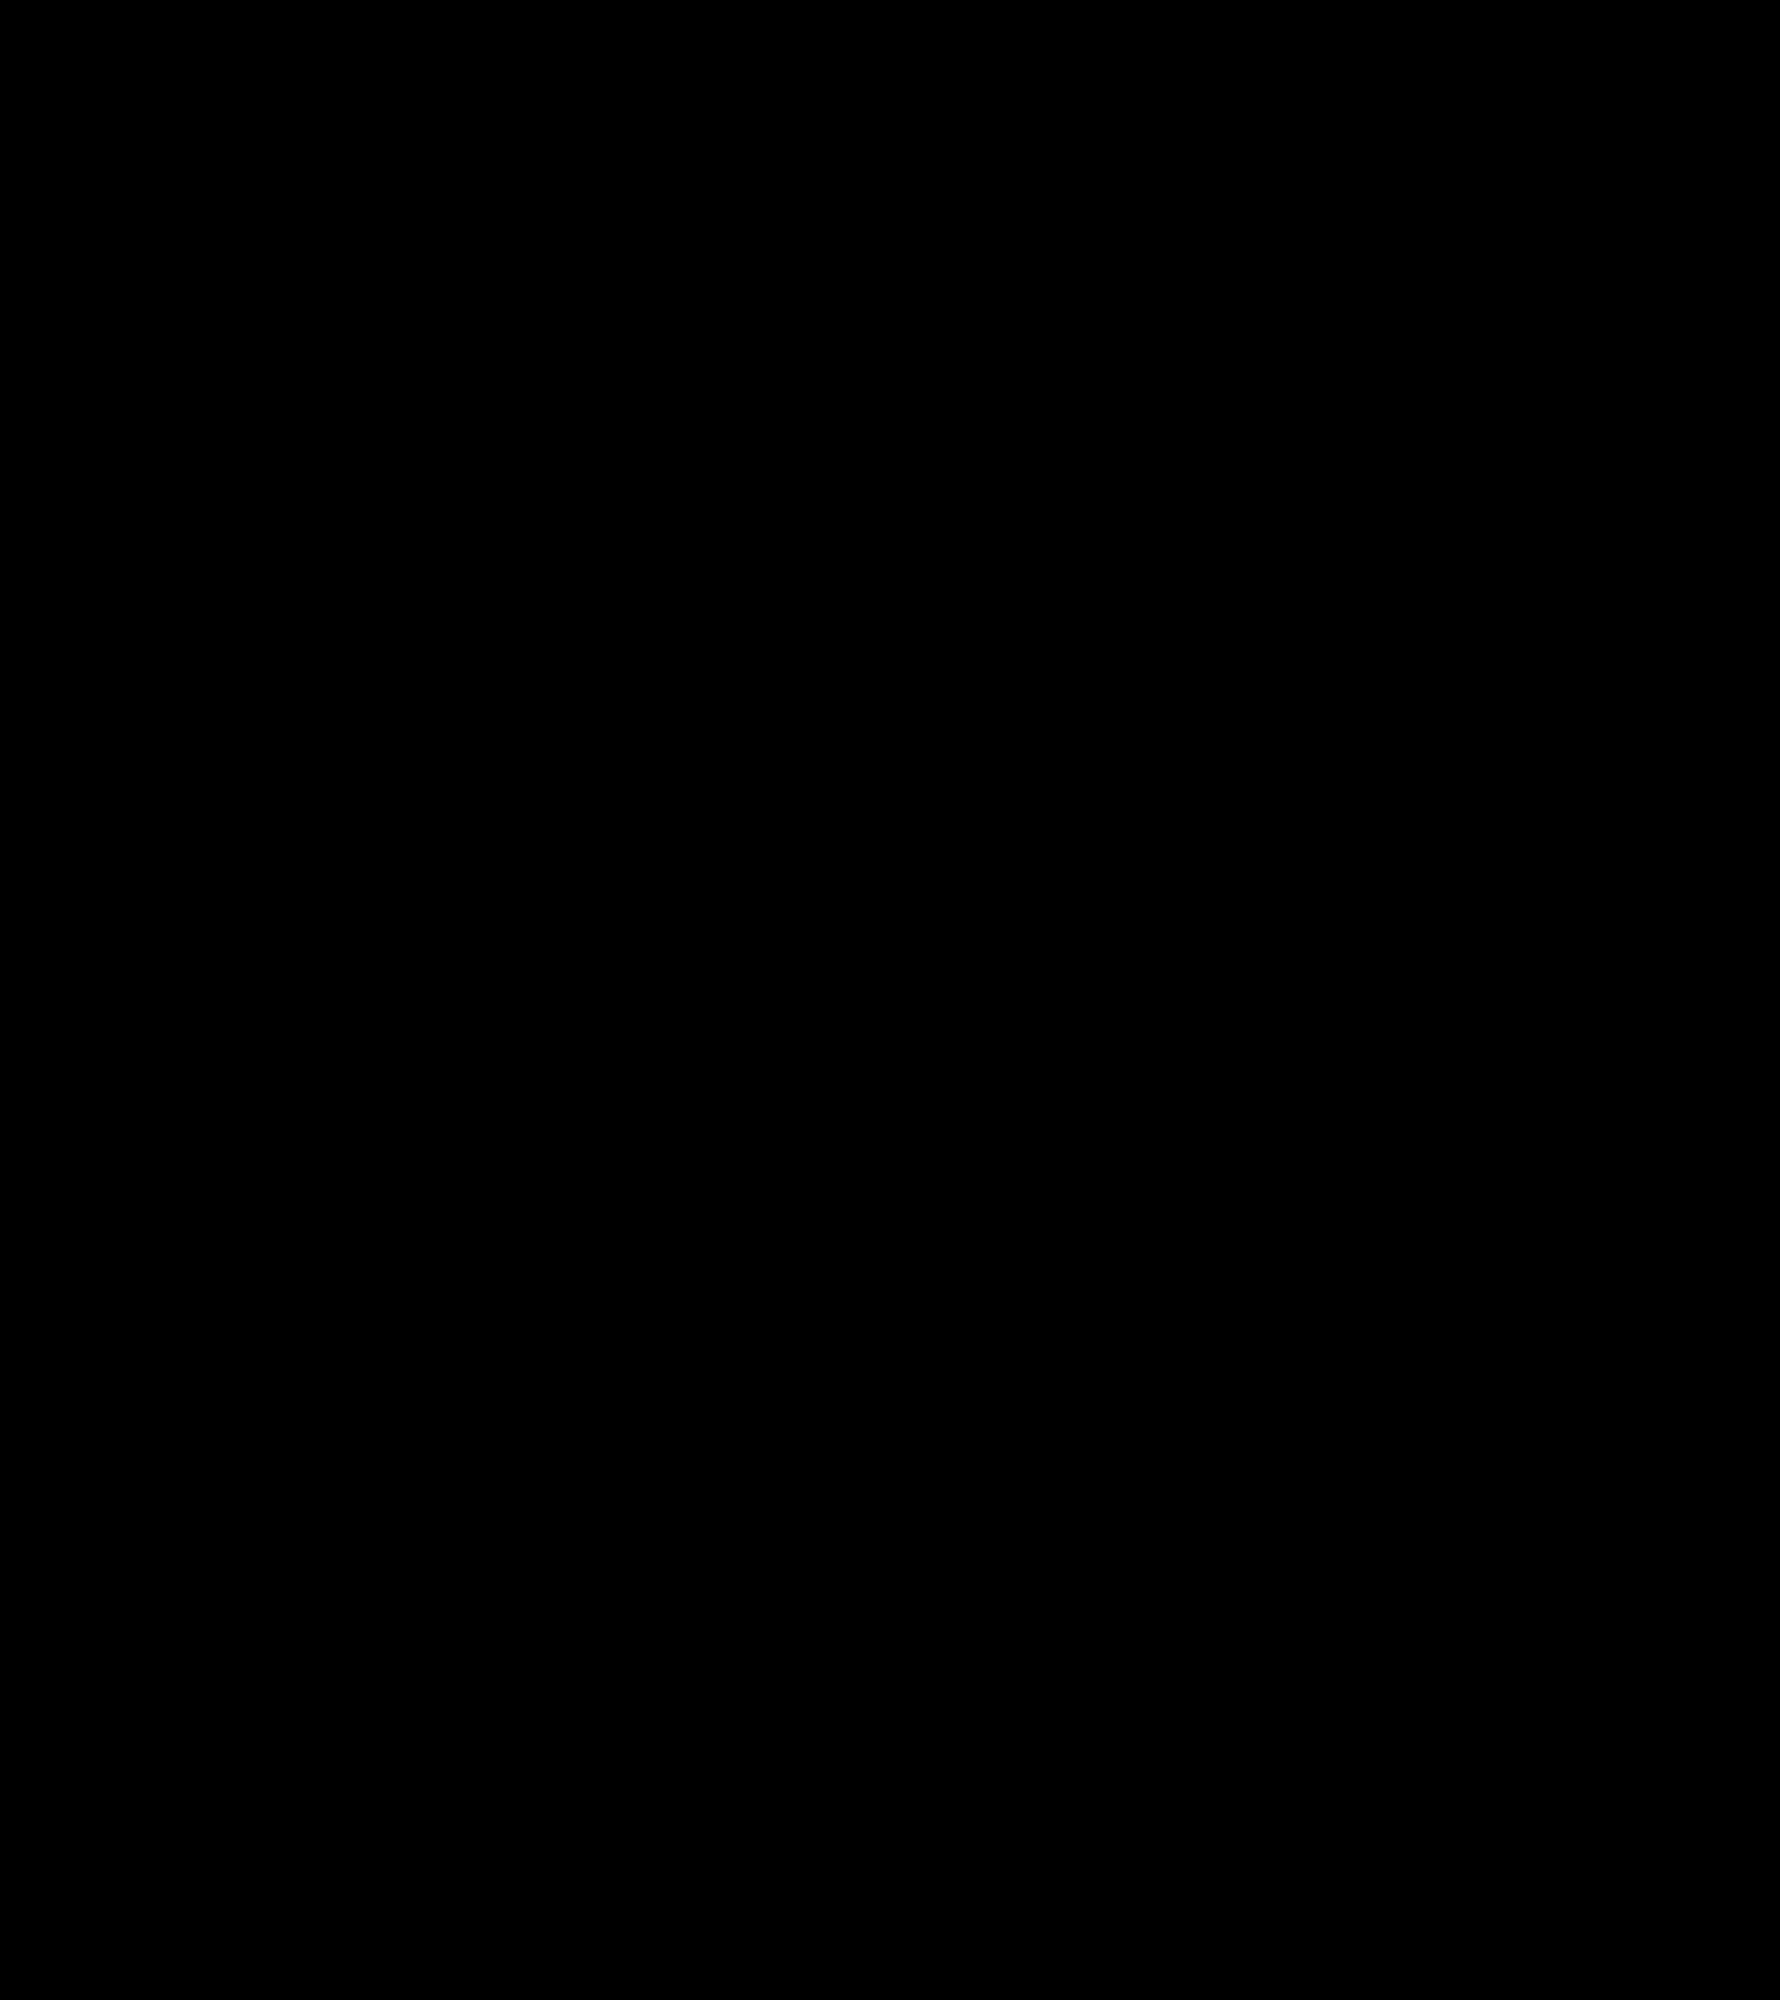 logo-blackon demand.png